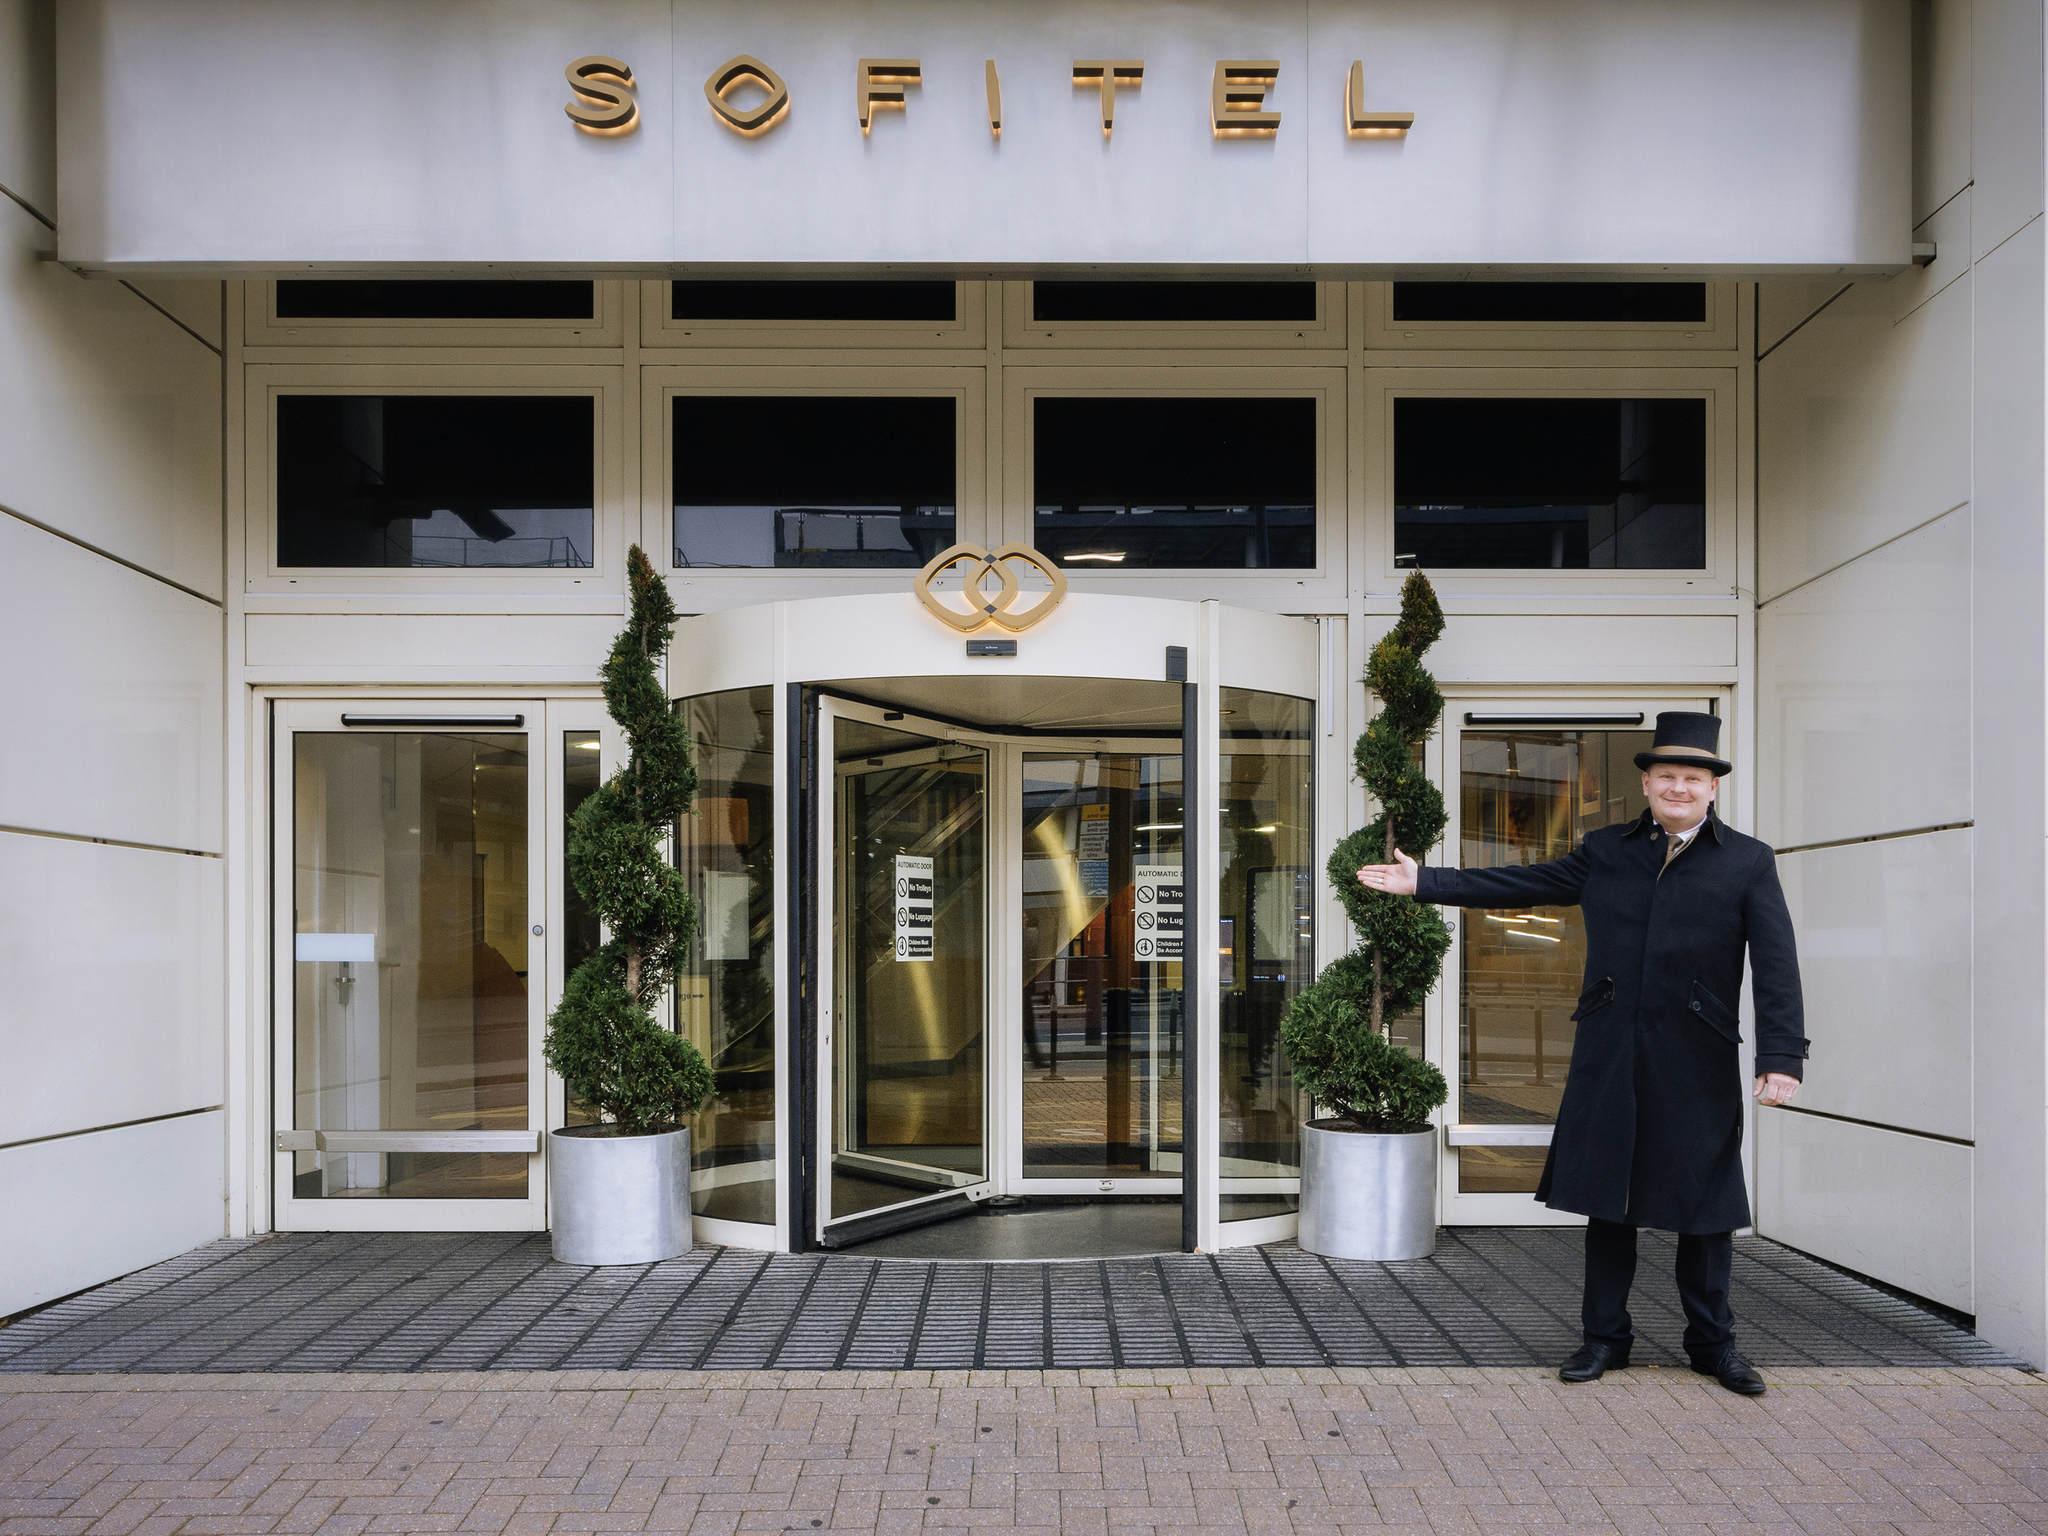 Hotel – Sofitel London Gatwick